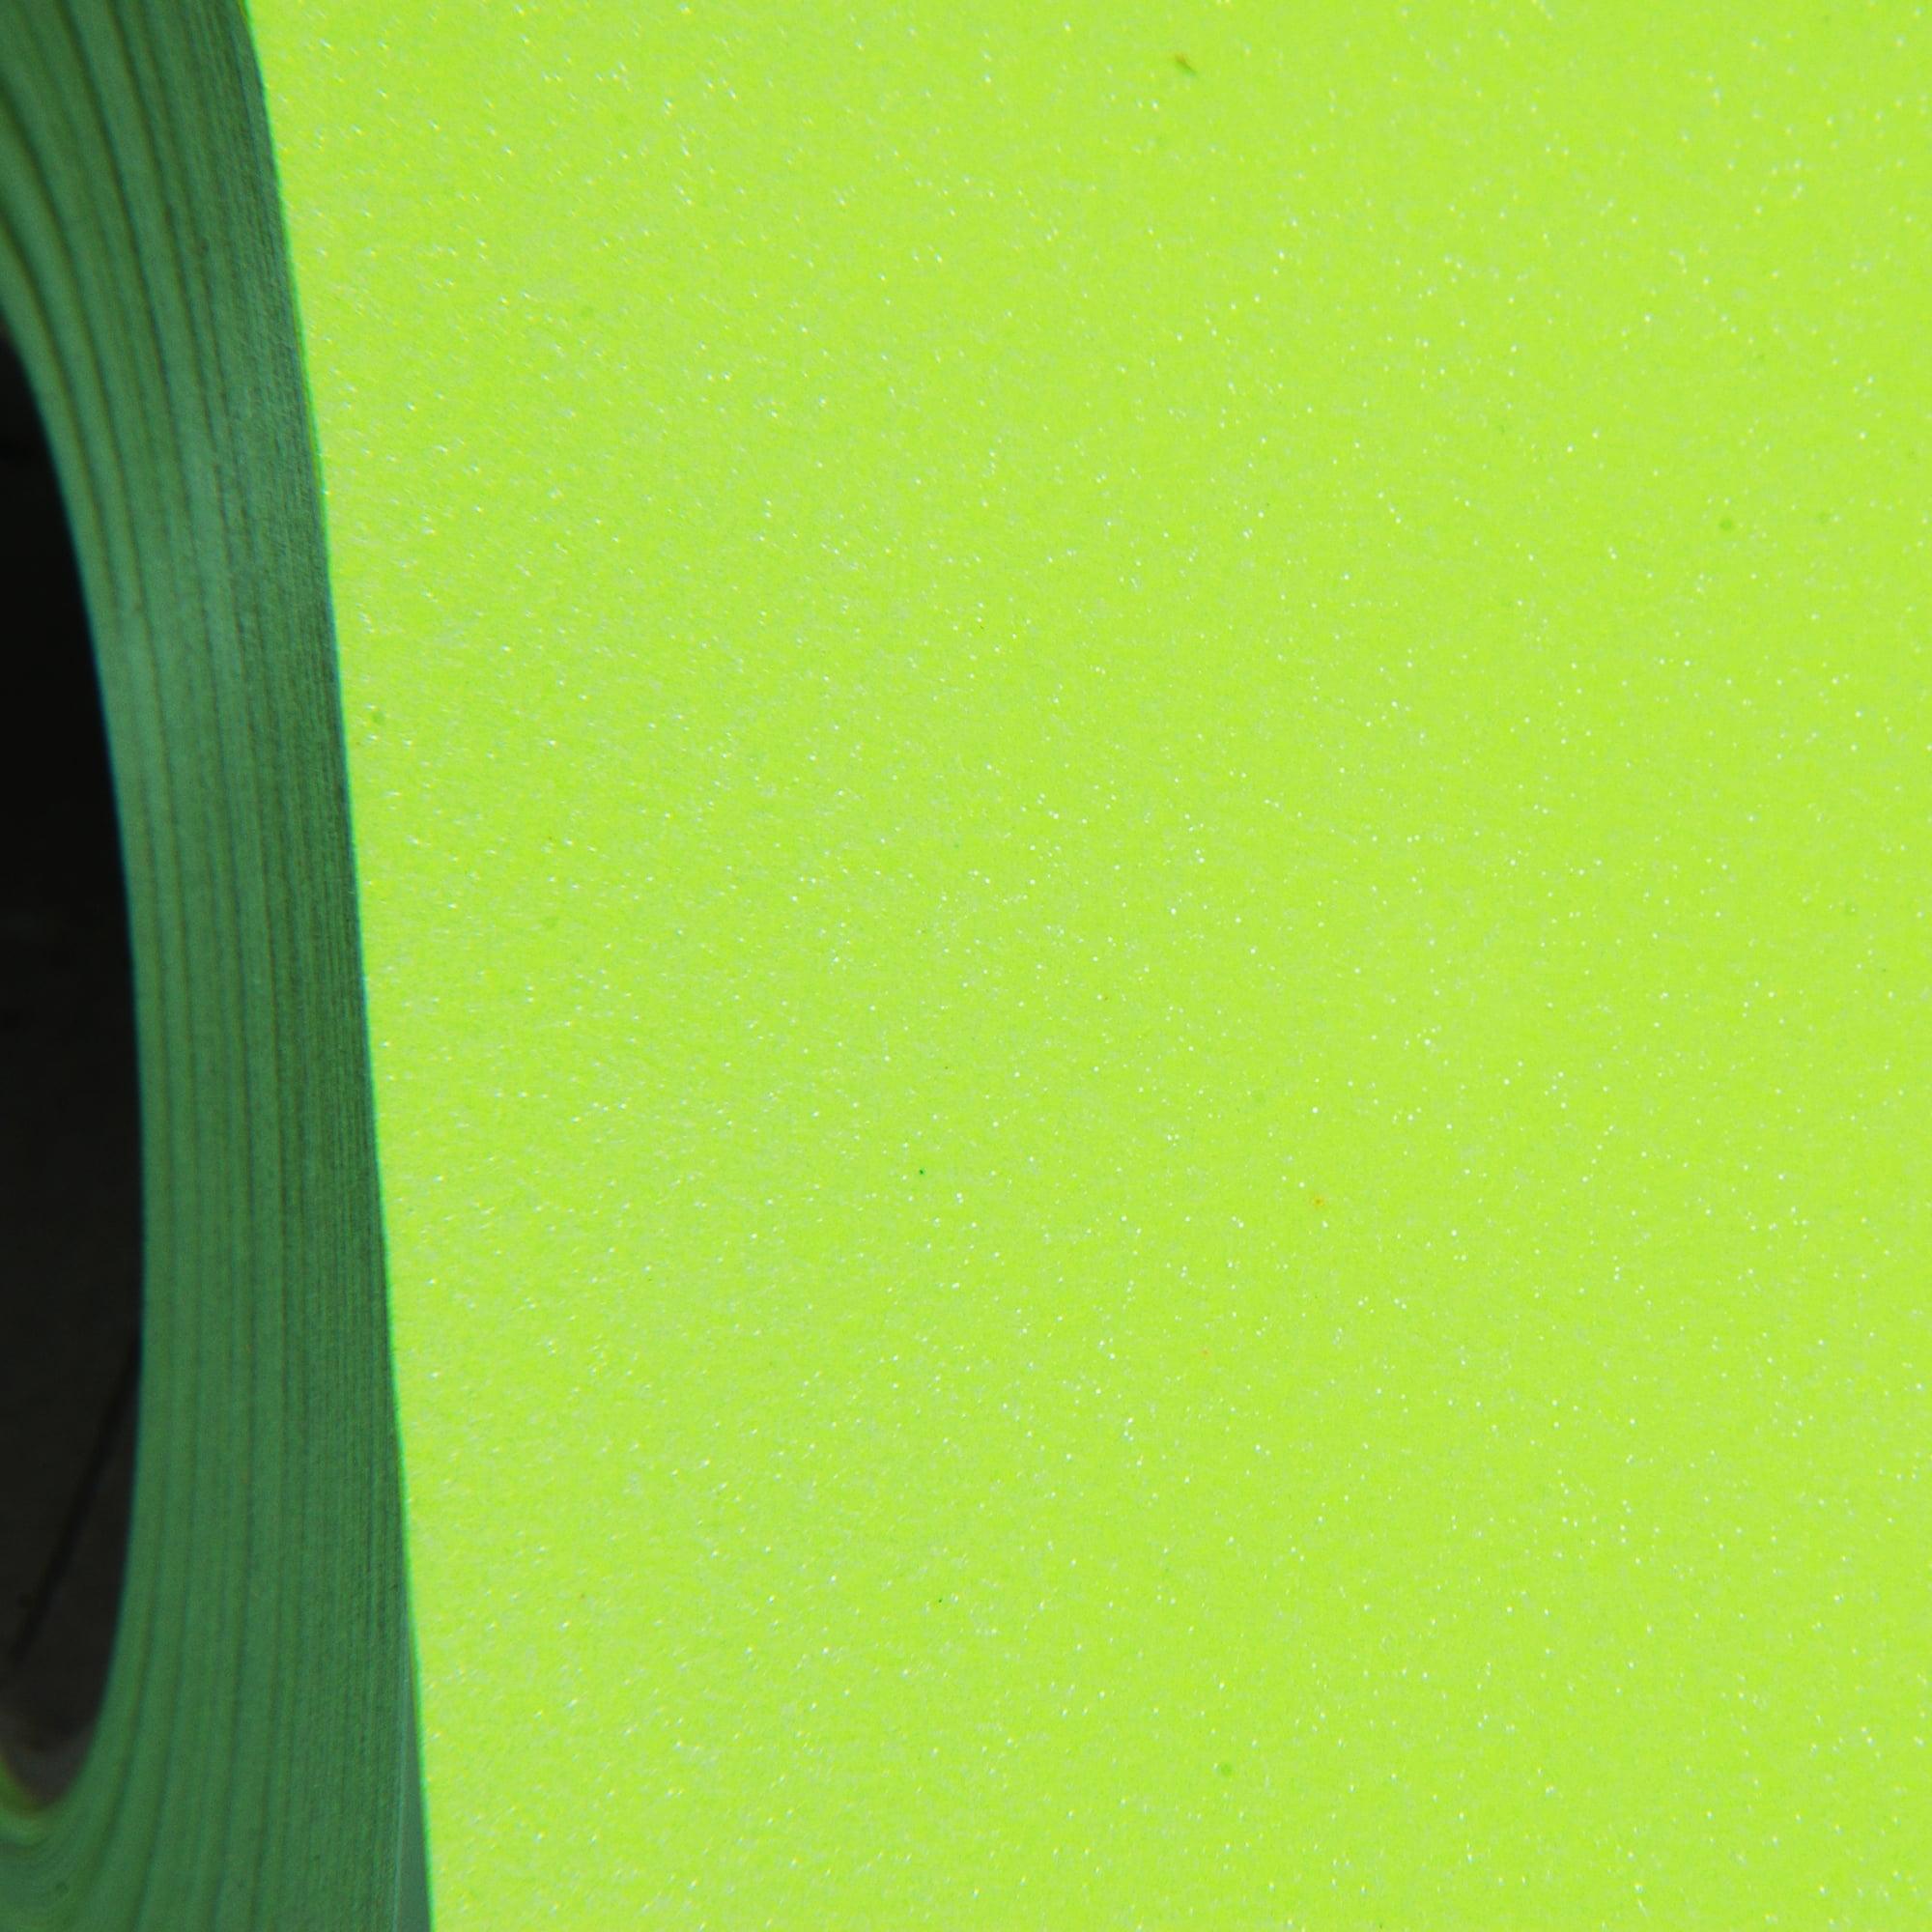 Threadart Glitter Neon Yellow 20 Quot Heat Transfer Vinyl Film